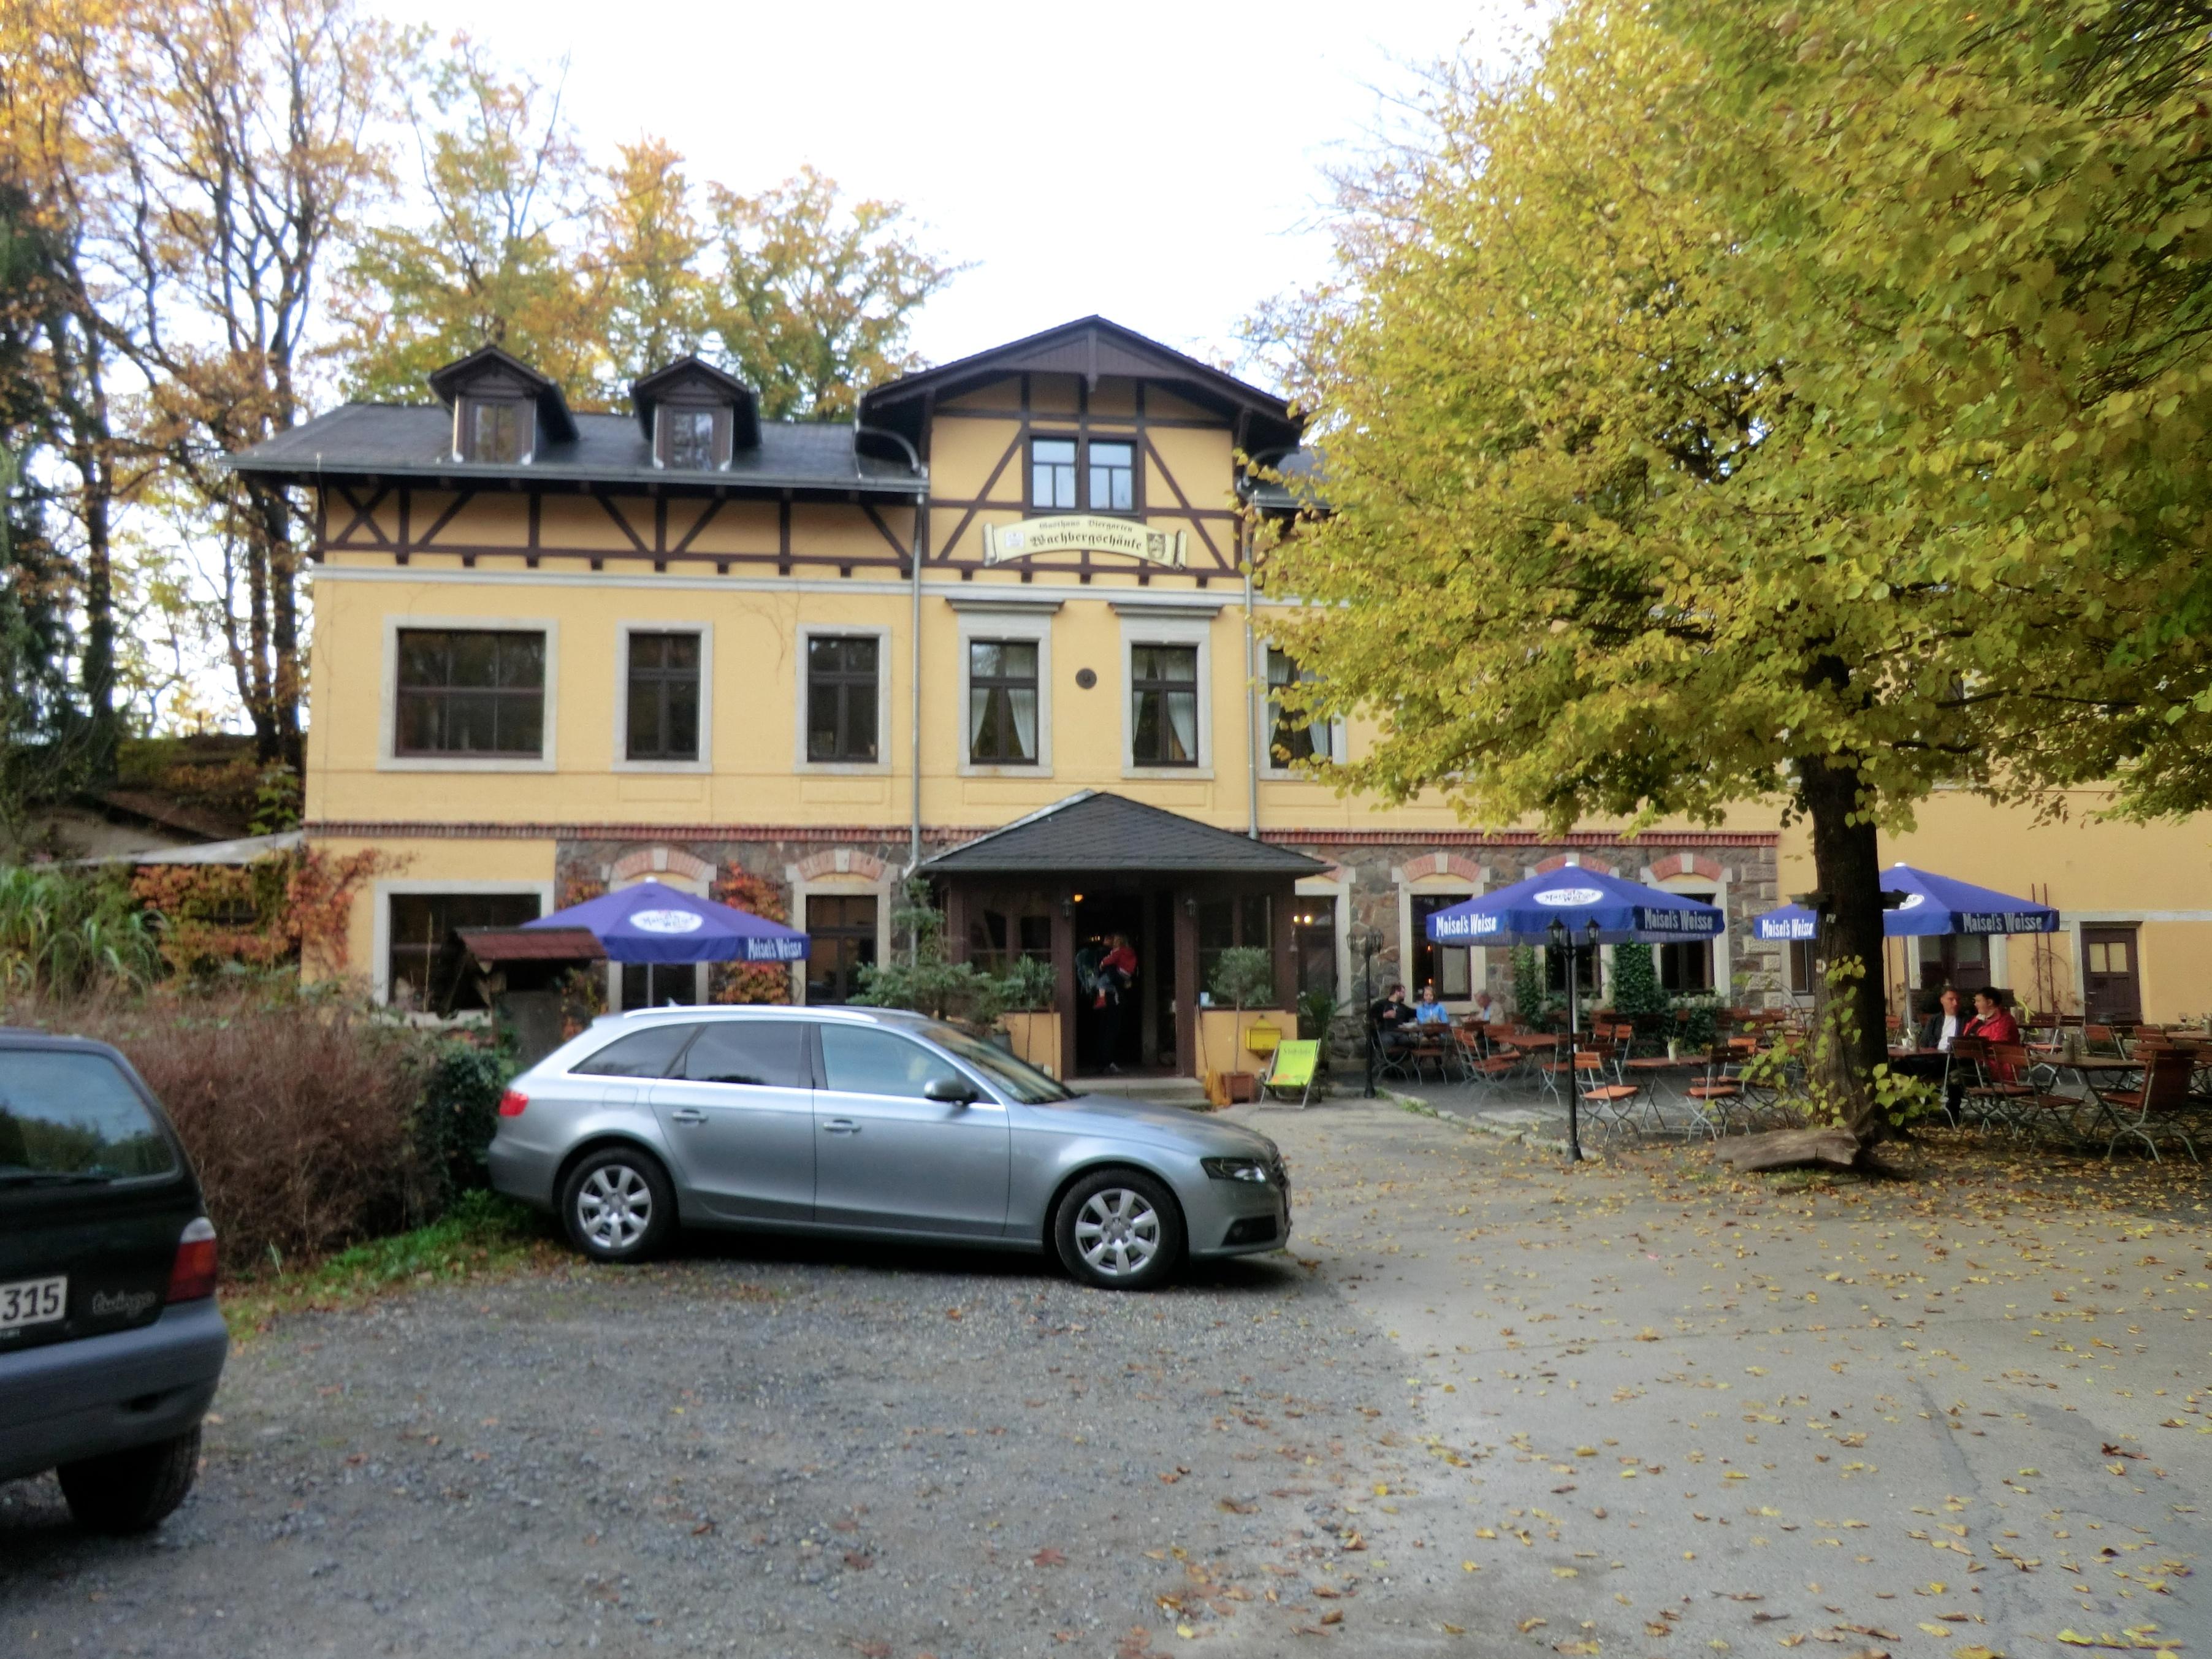 File:Wachbergschänke Wachwitz.jpg - Wikimedia Commons